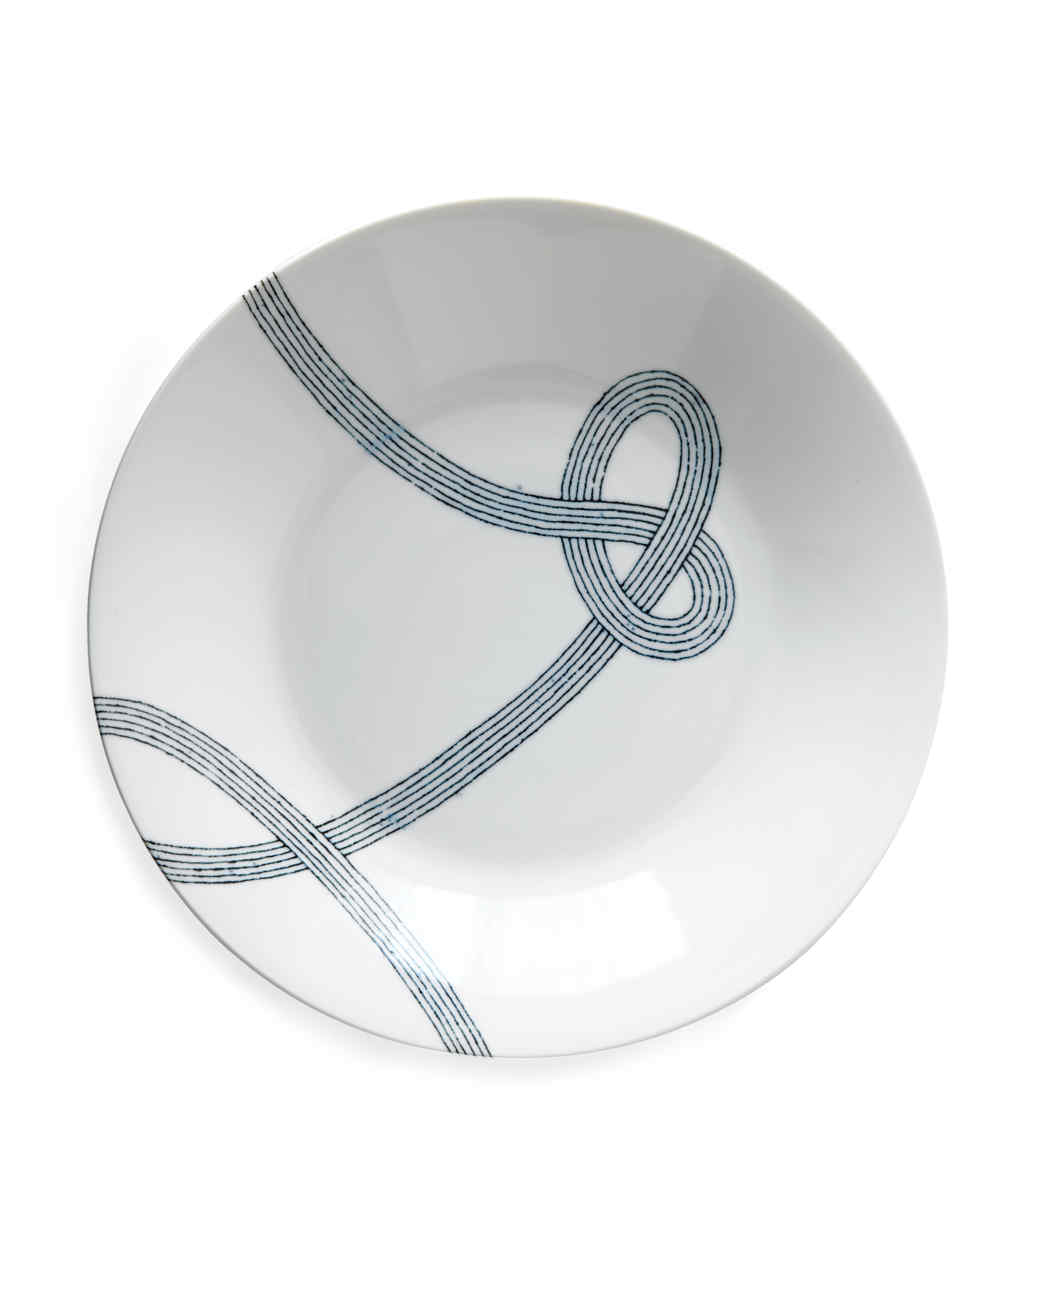 plates-02-mld108682.jpg